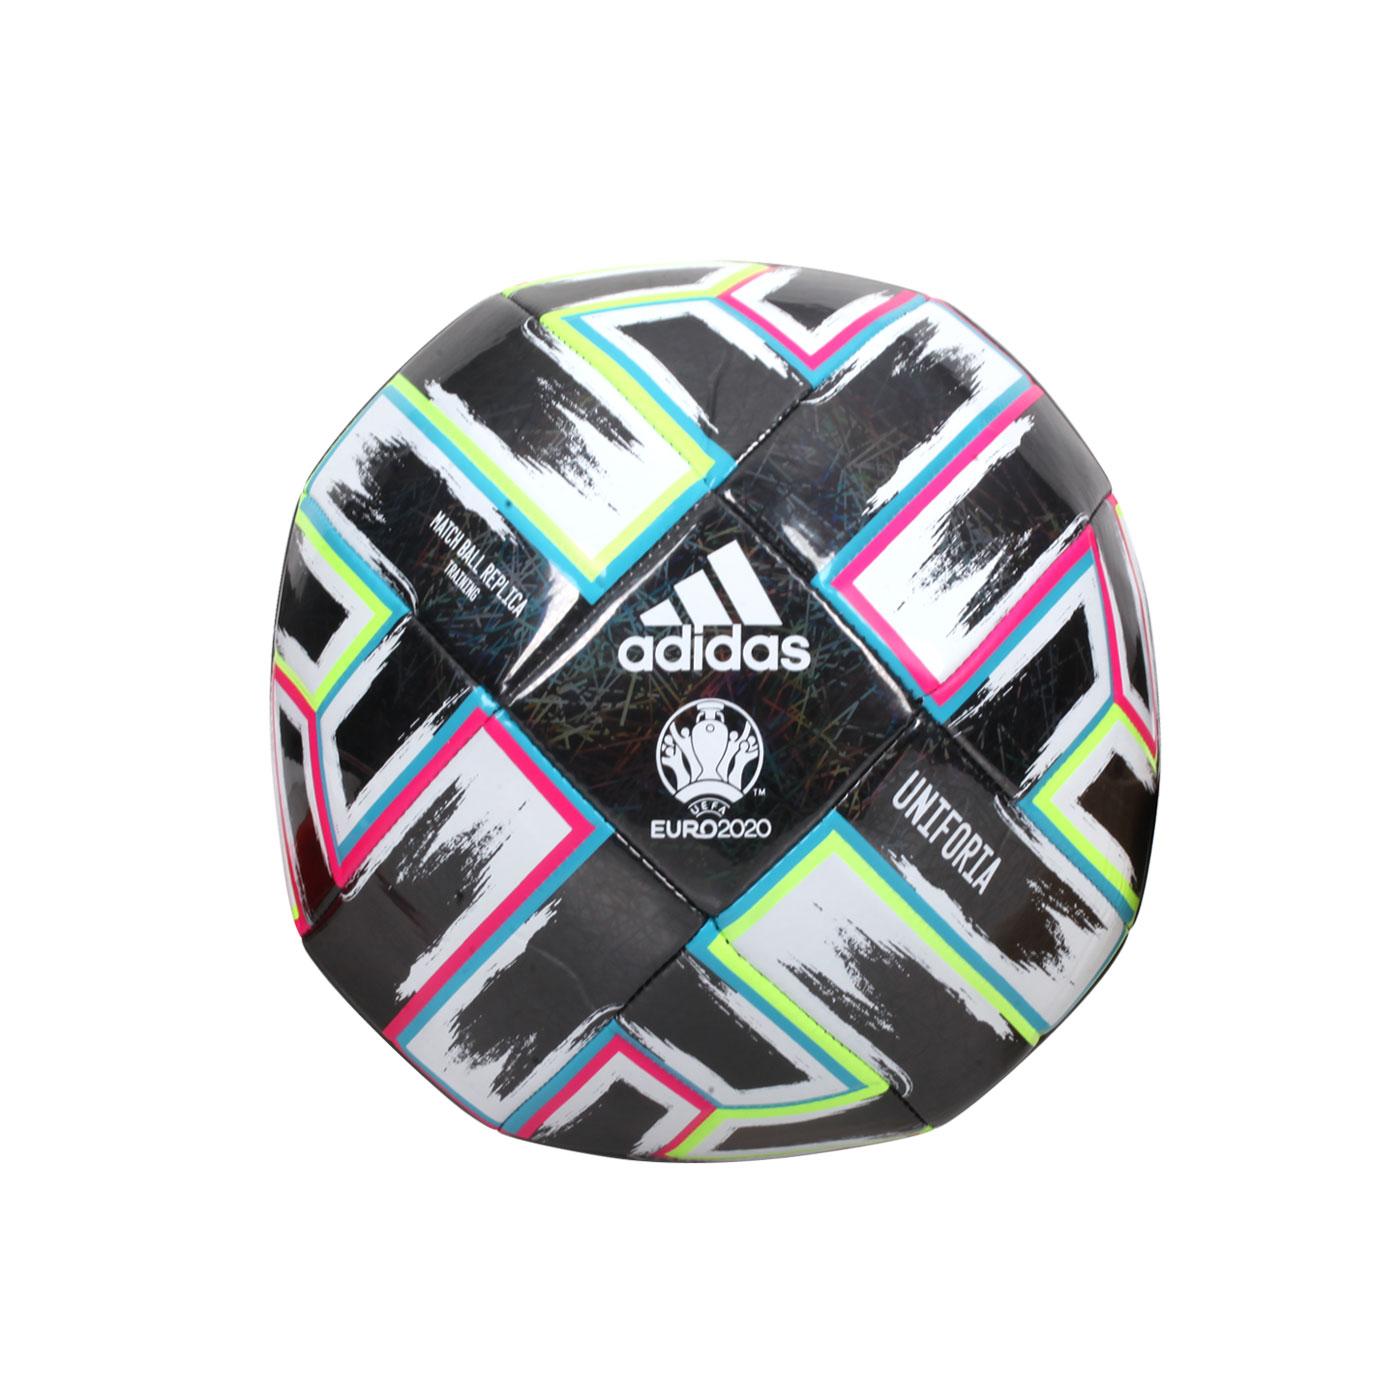 ADIDAS 足球 FP9745 - 黑白藍綠紅